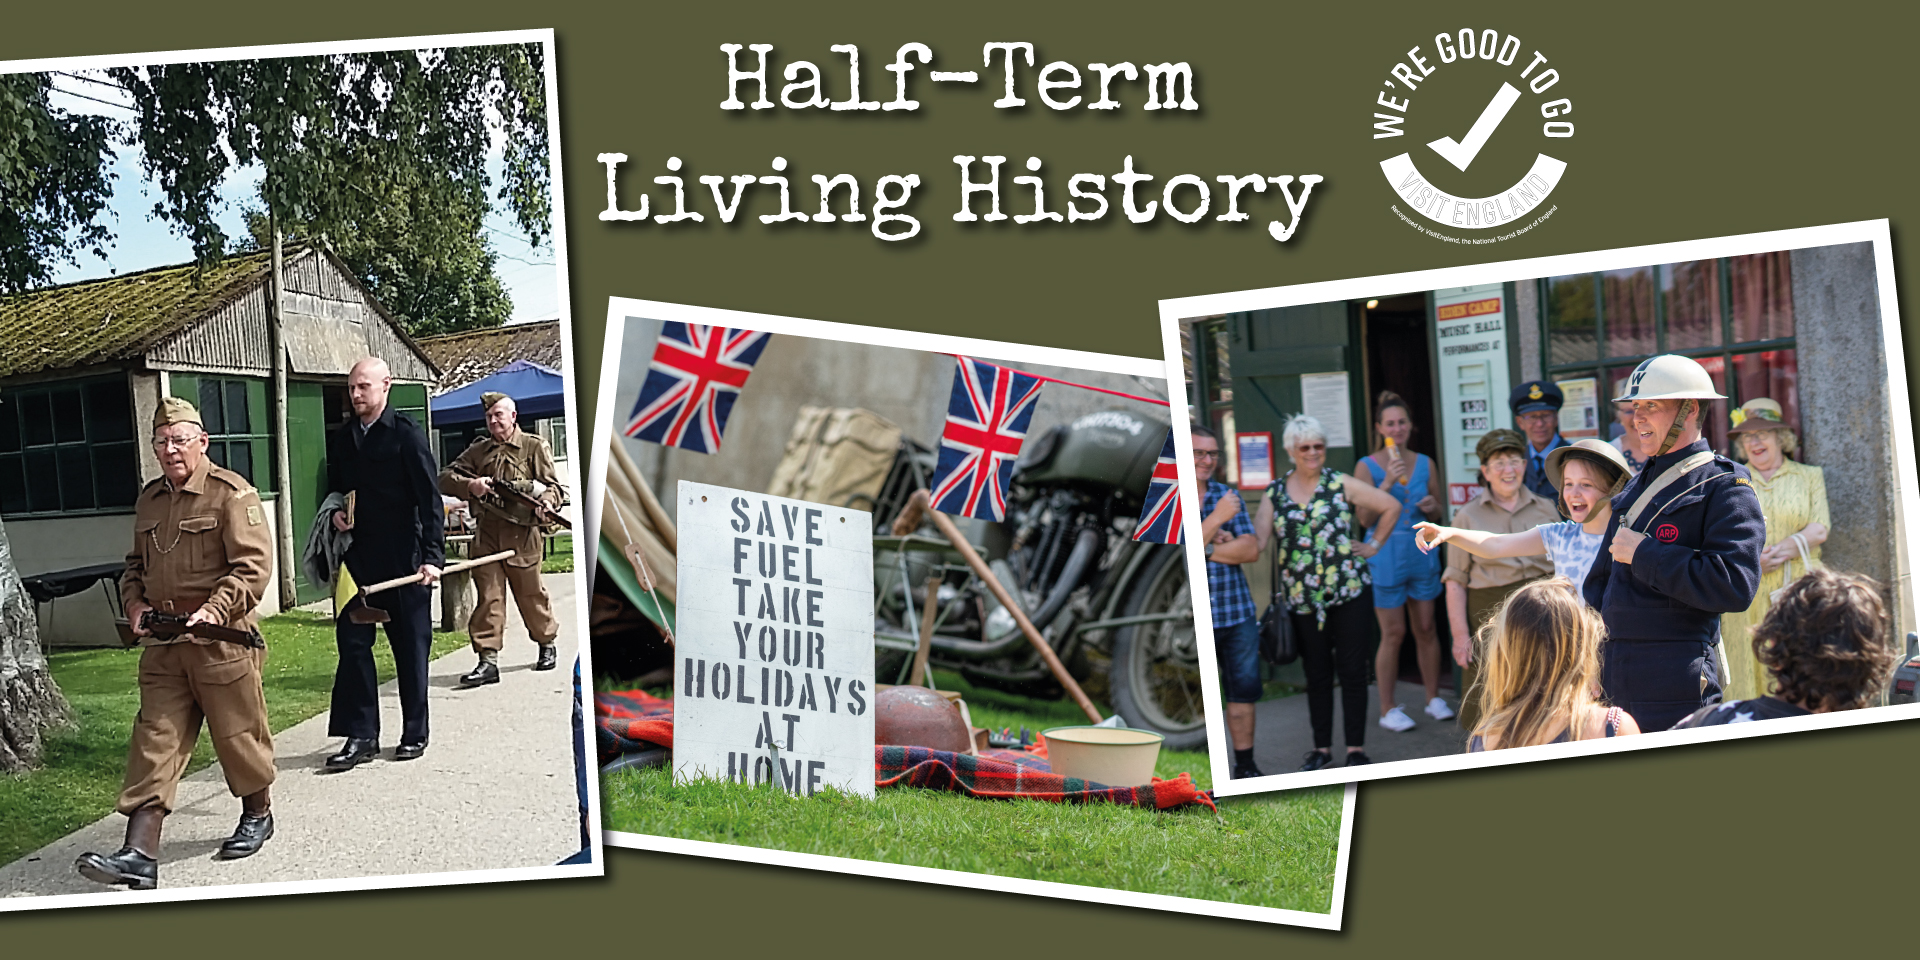 Half Term Living History!